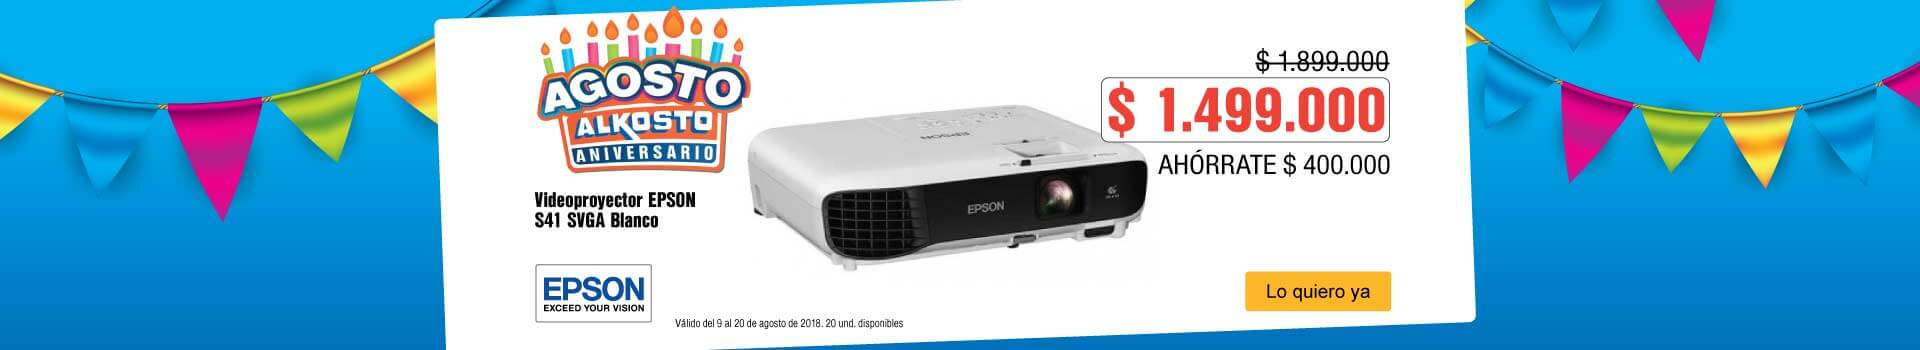 AK-BCAT-4-computadores y tablets-PP---Epson-Videoproyector S41-Ago15